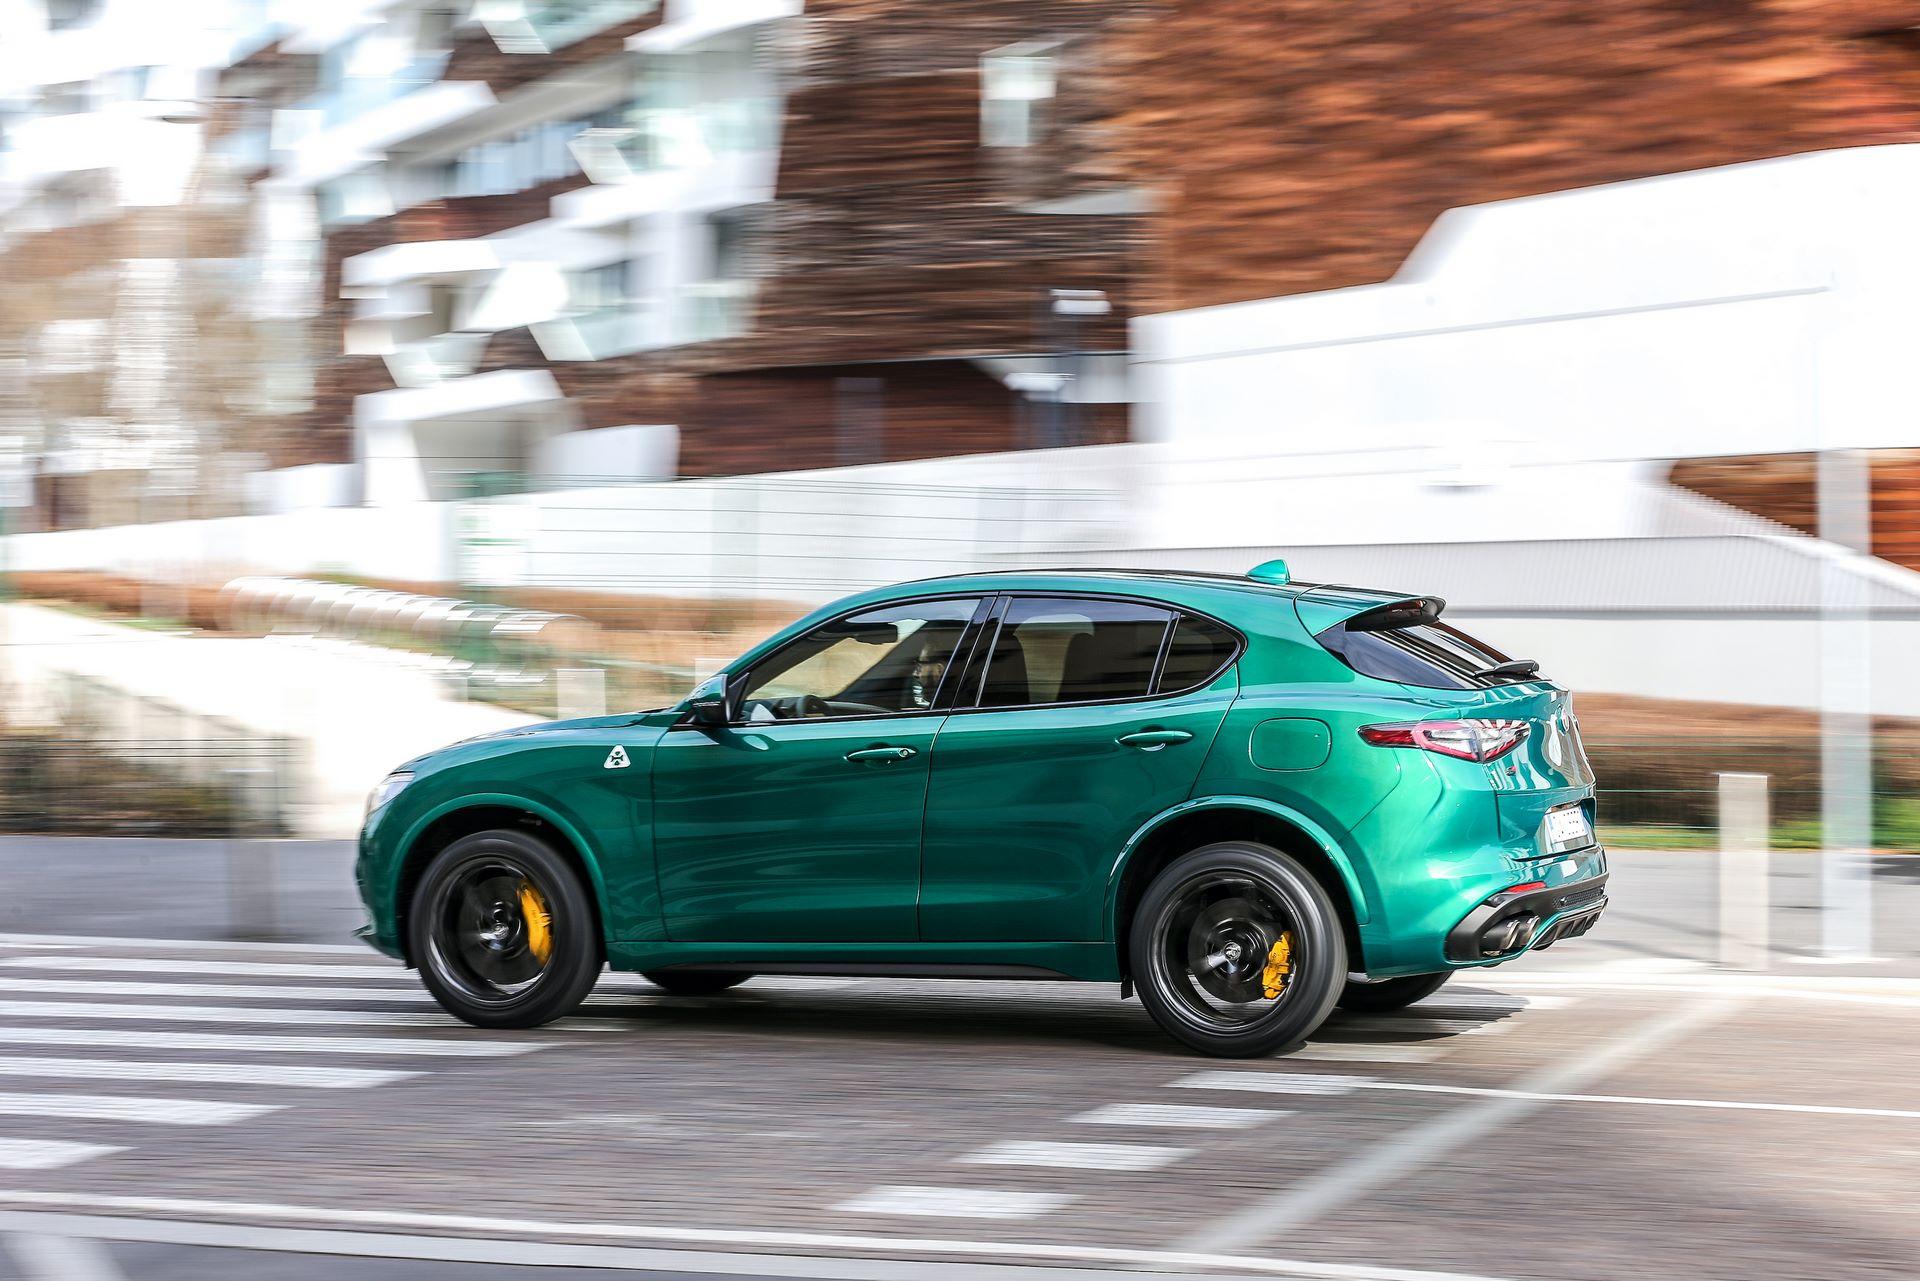 Alfa-Romeo-Giulia-Quadrifoglio-Stelvio-Quadrifoglio-facelift-2020-29